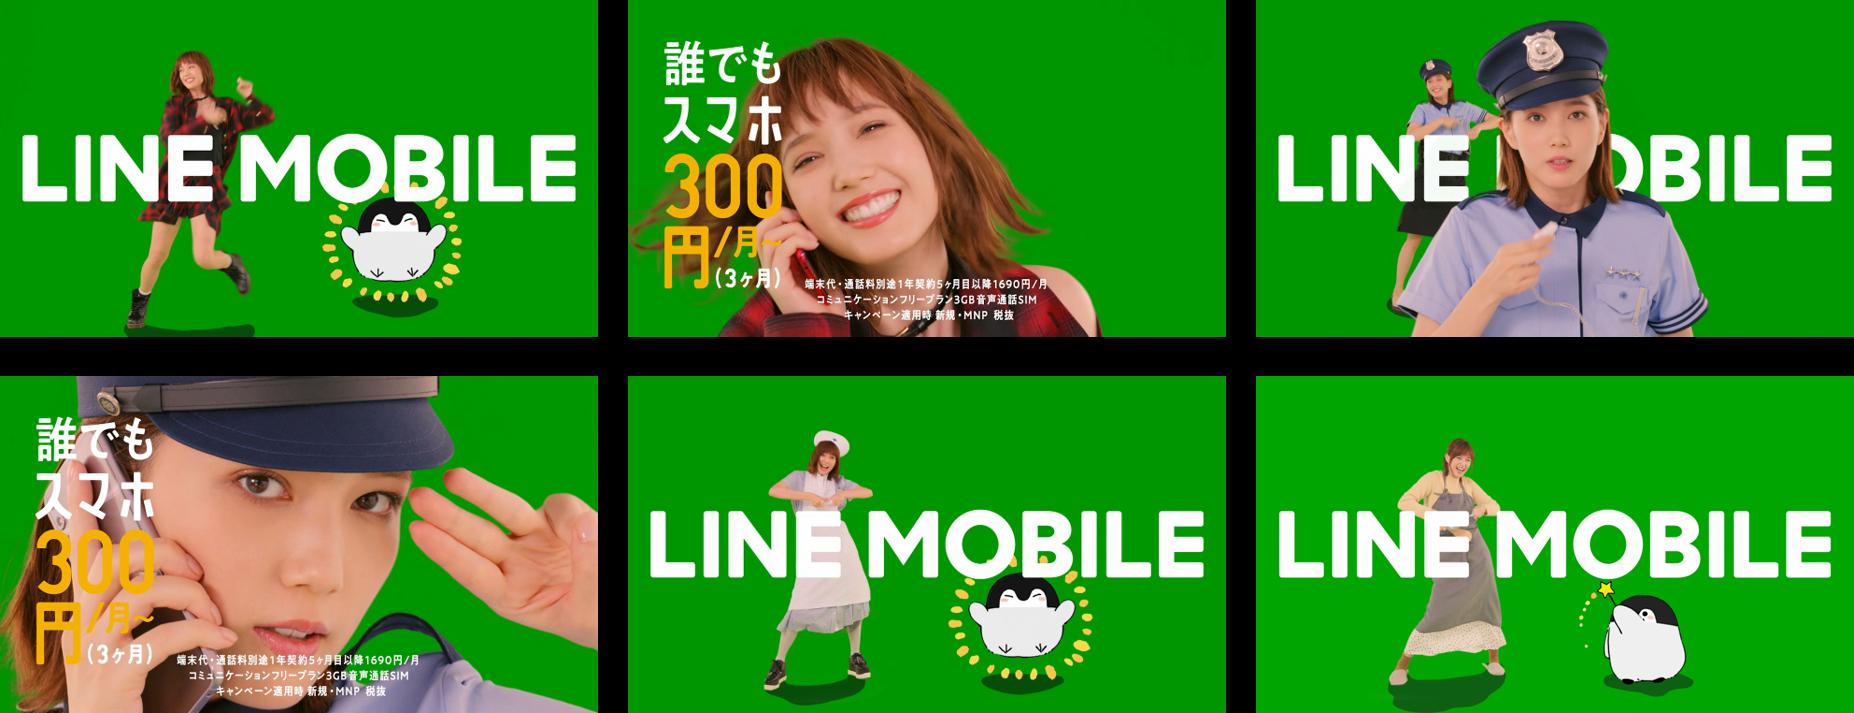 /stf/linecorp/ja/pr/linemobilecm_02.png